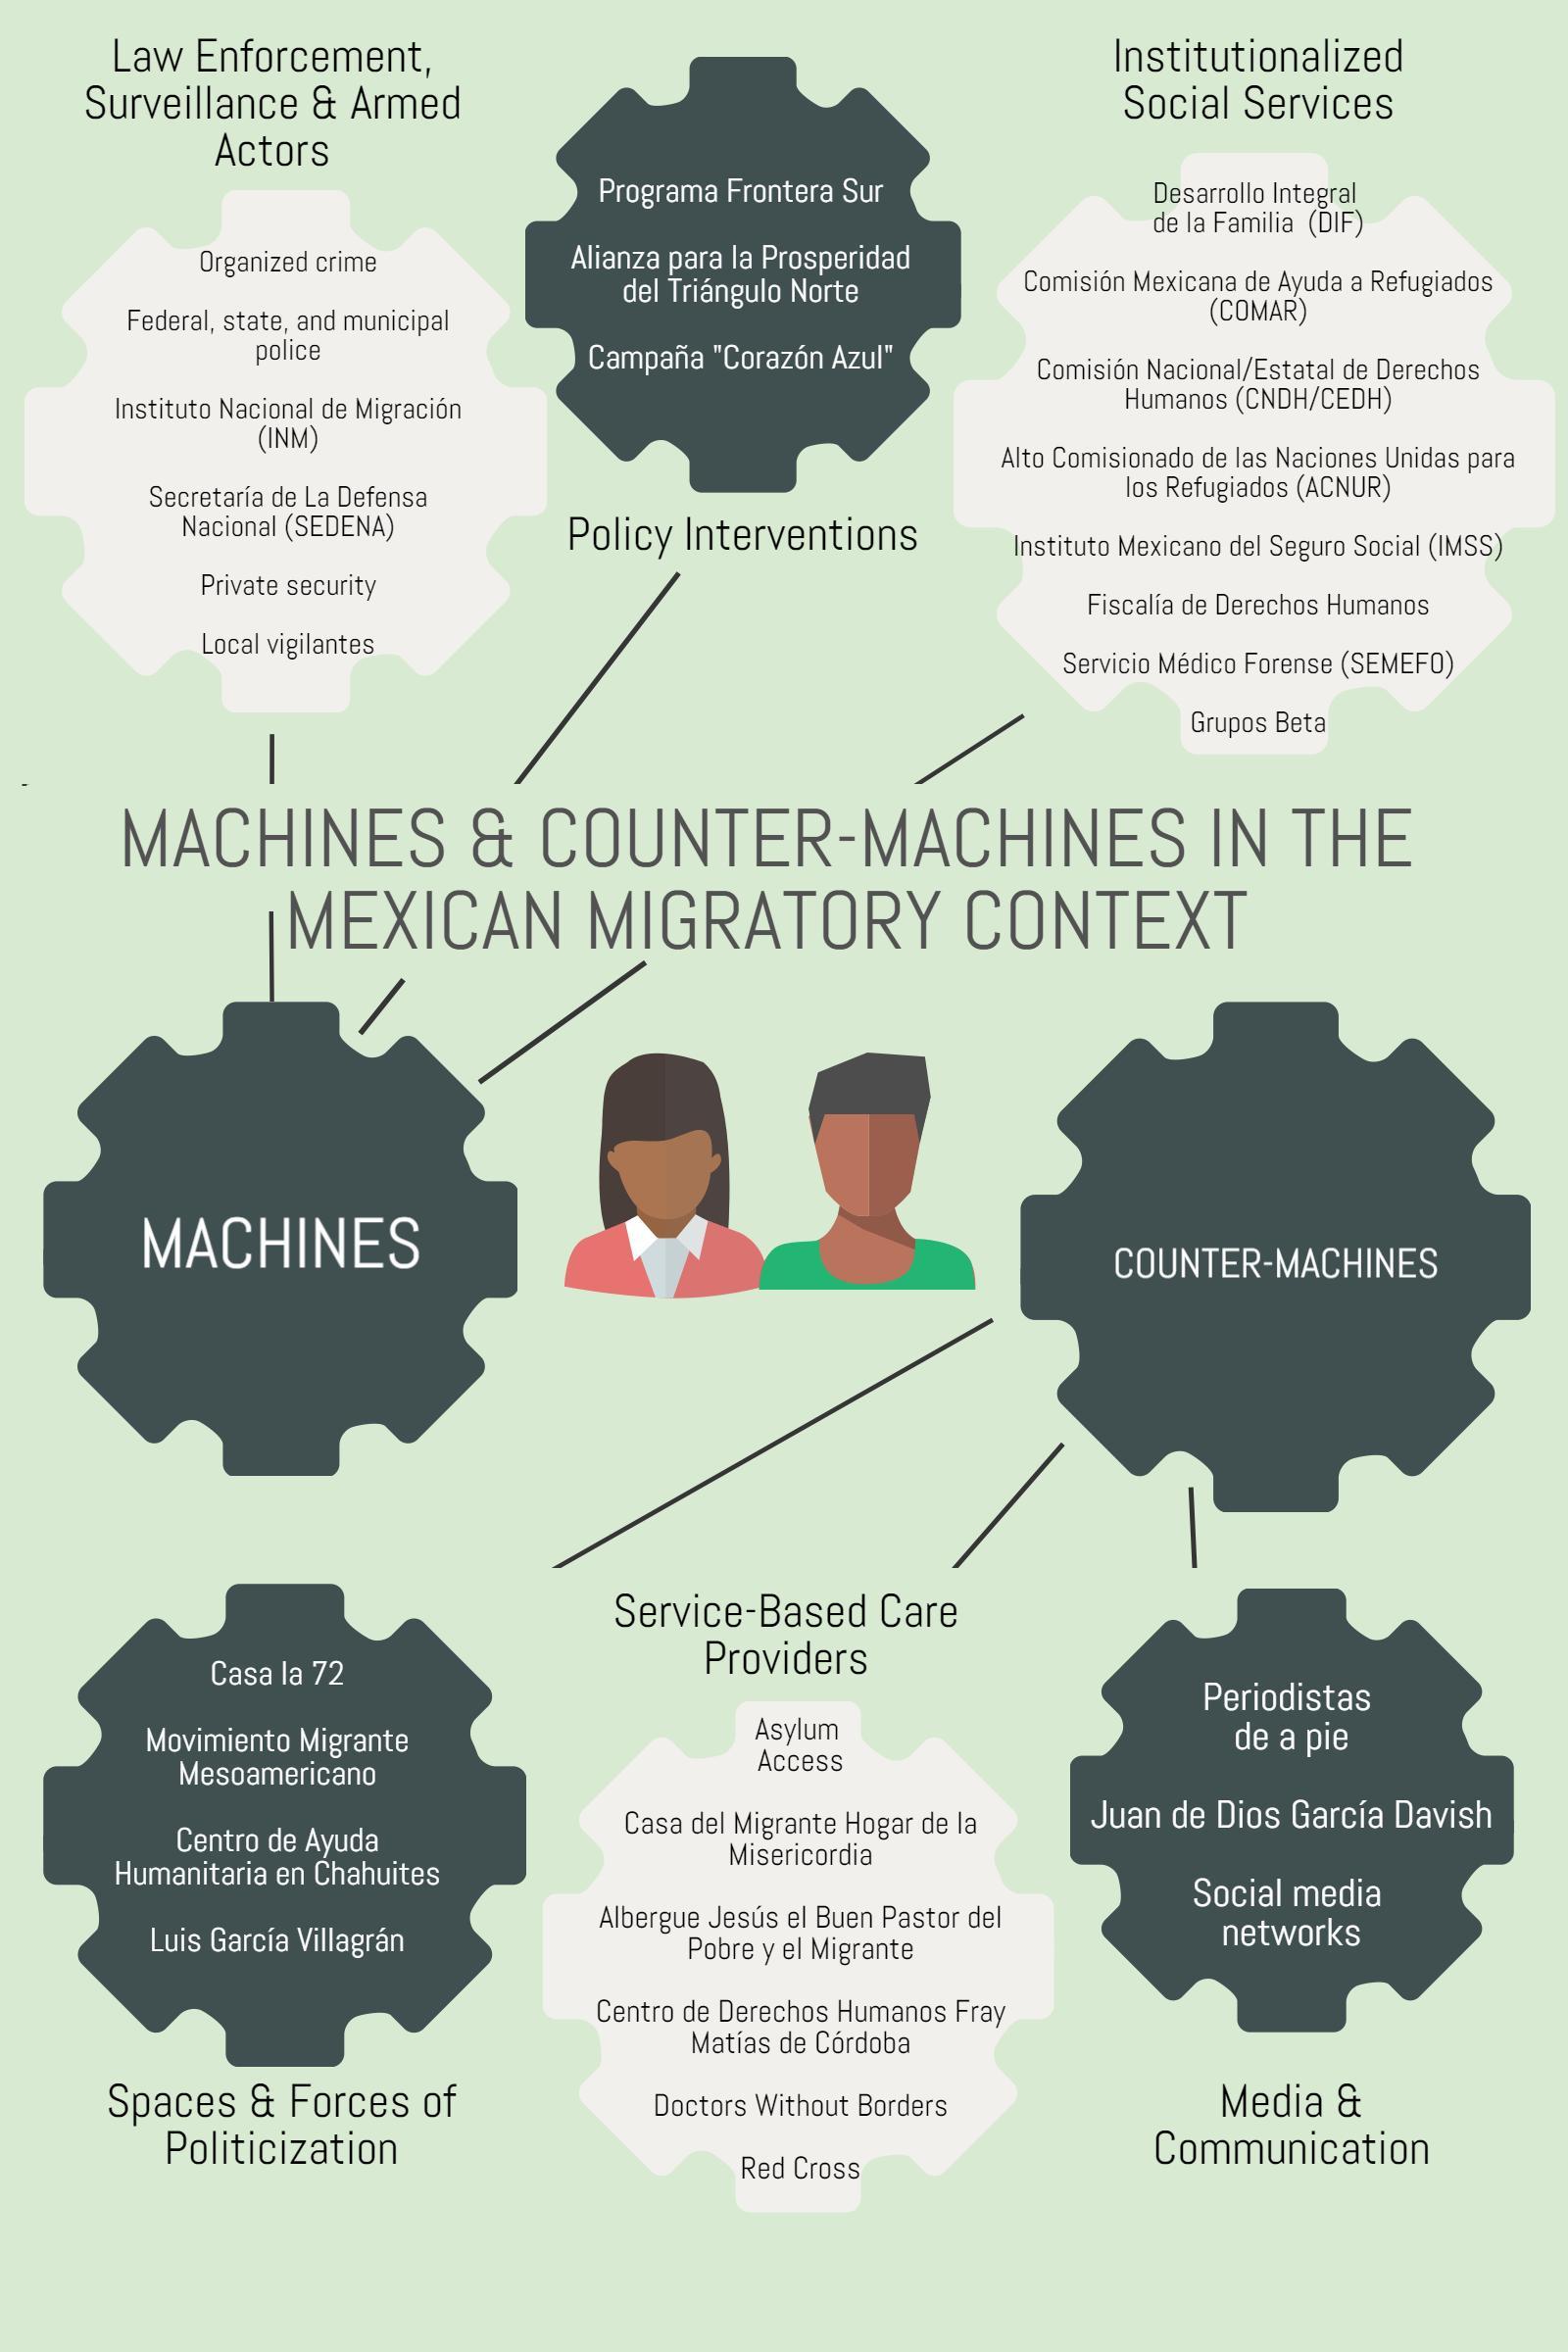 New Infographic (4)